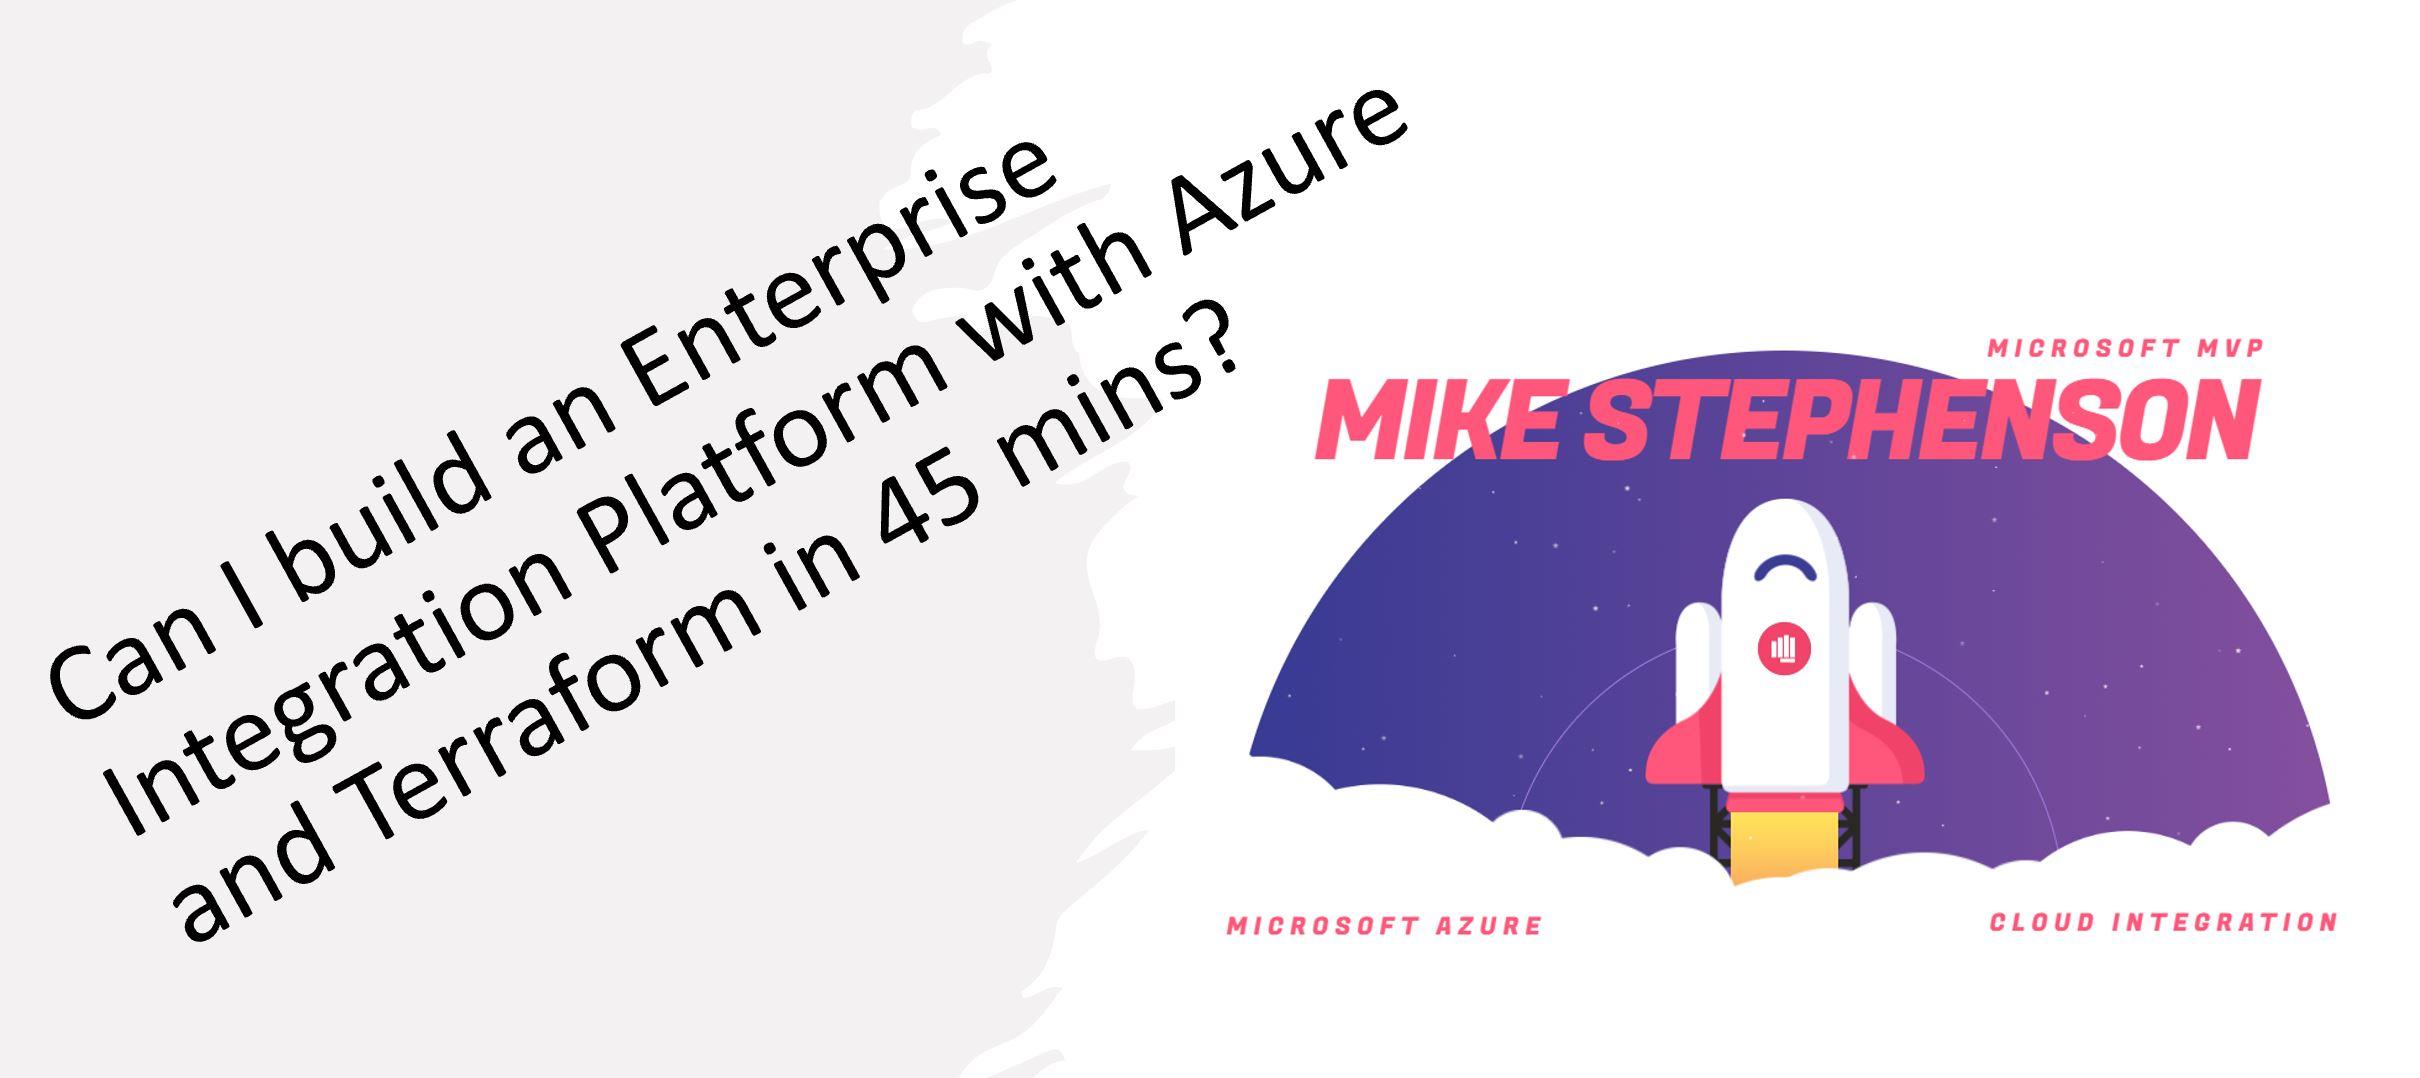 Can I build an Enterprise Integration Platform with Azure and Terraform in 45 mins?